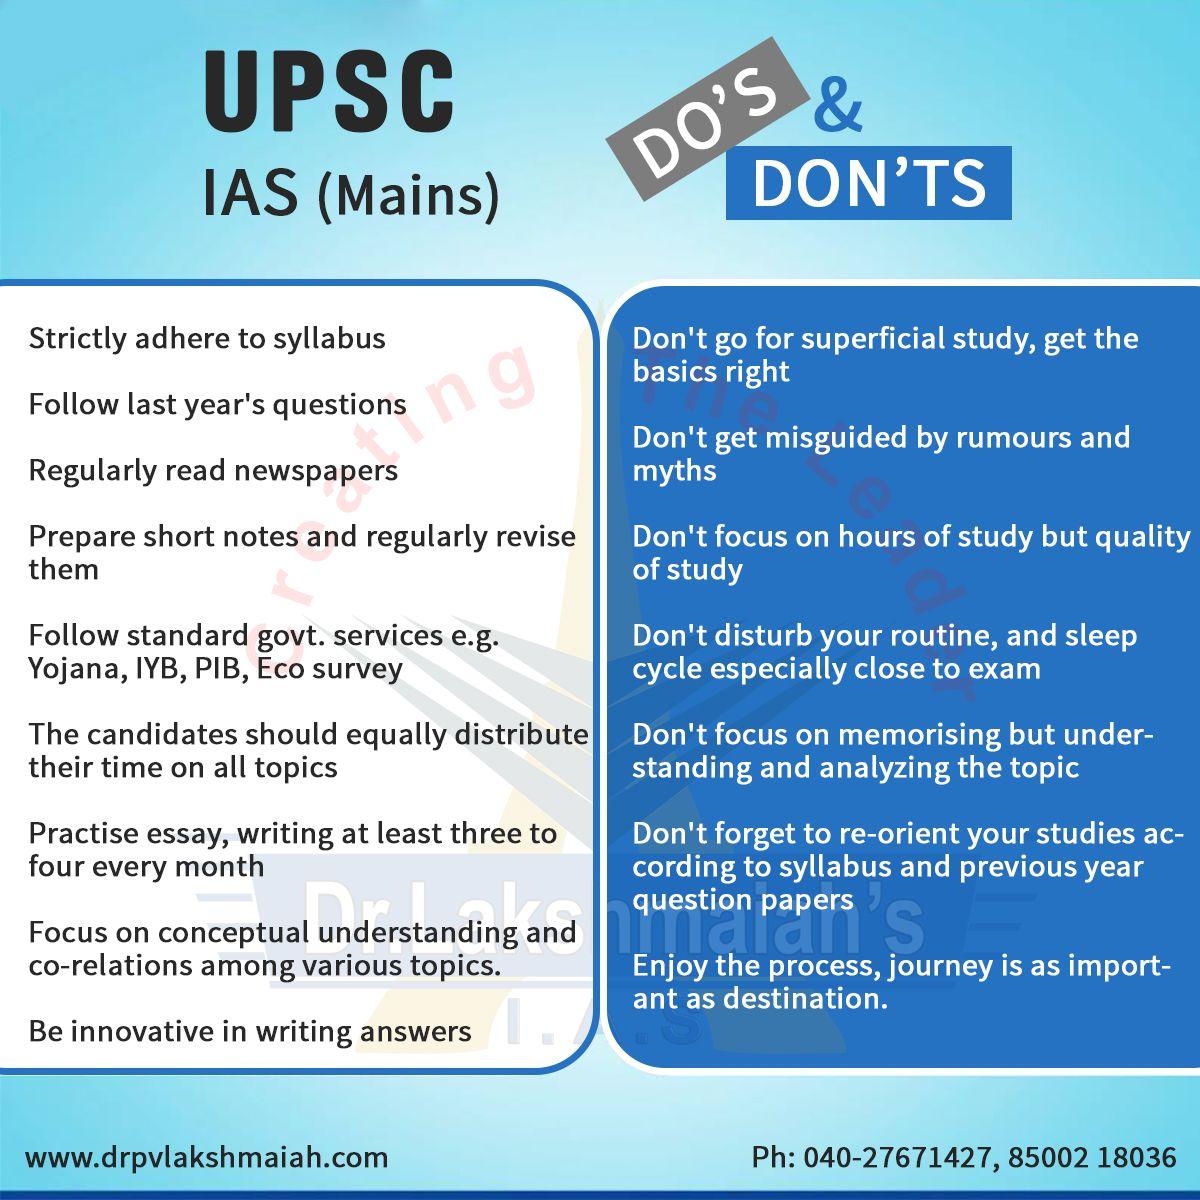 Do S Don T For Upsc Ia Main More Update Follow U Http Plu Google Com 0 Drlakshmaiahiasst Economic Lesson Exam Study Tip Skills Ccmb Hyderabad Dissertation